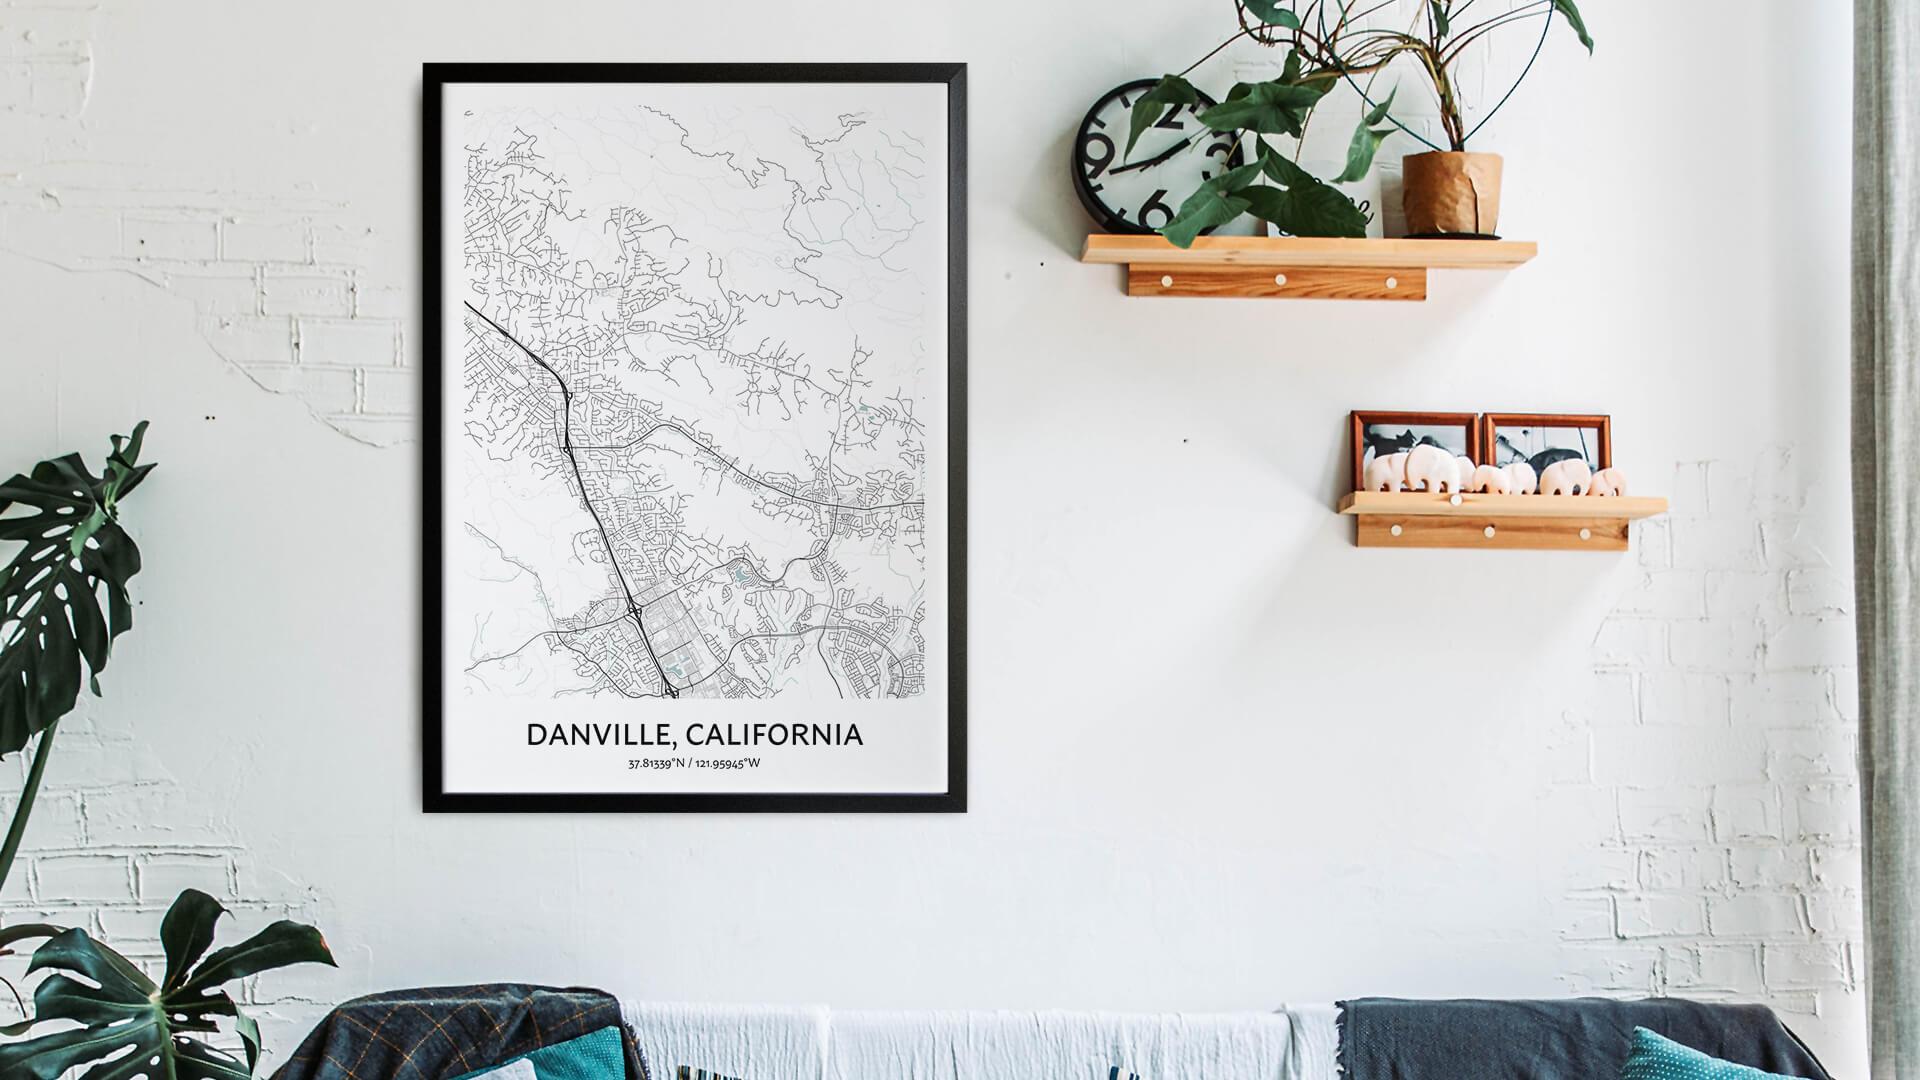 Danville map art